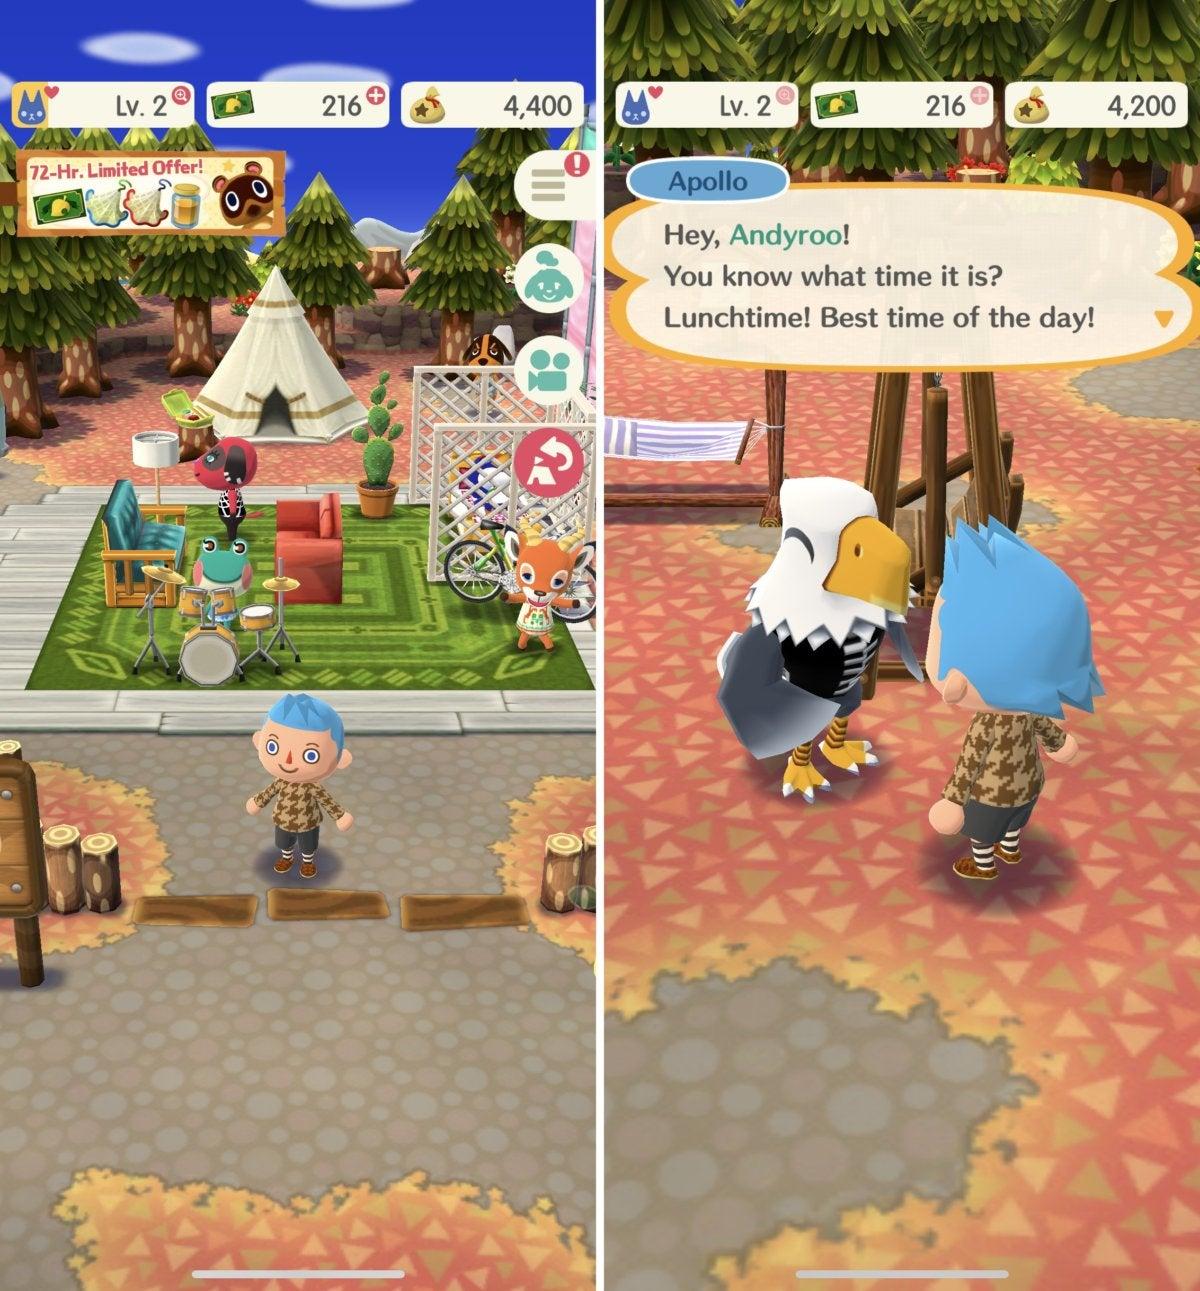 iphonex games animalcrossing